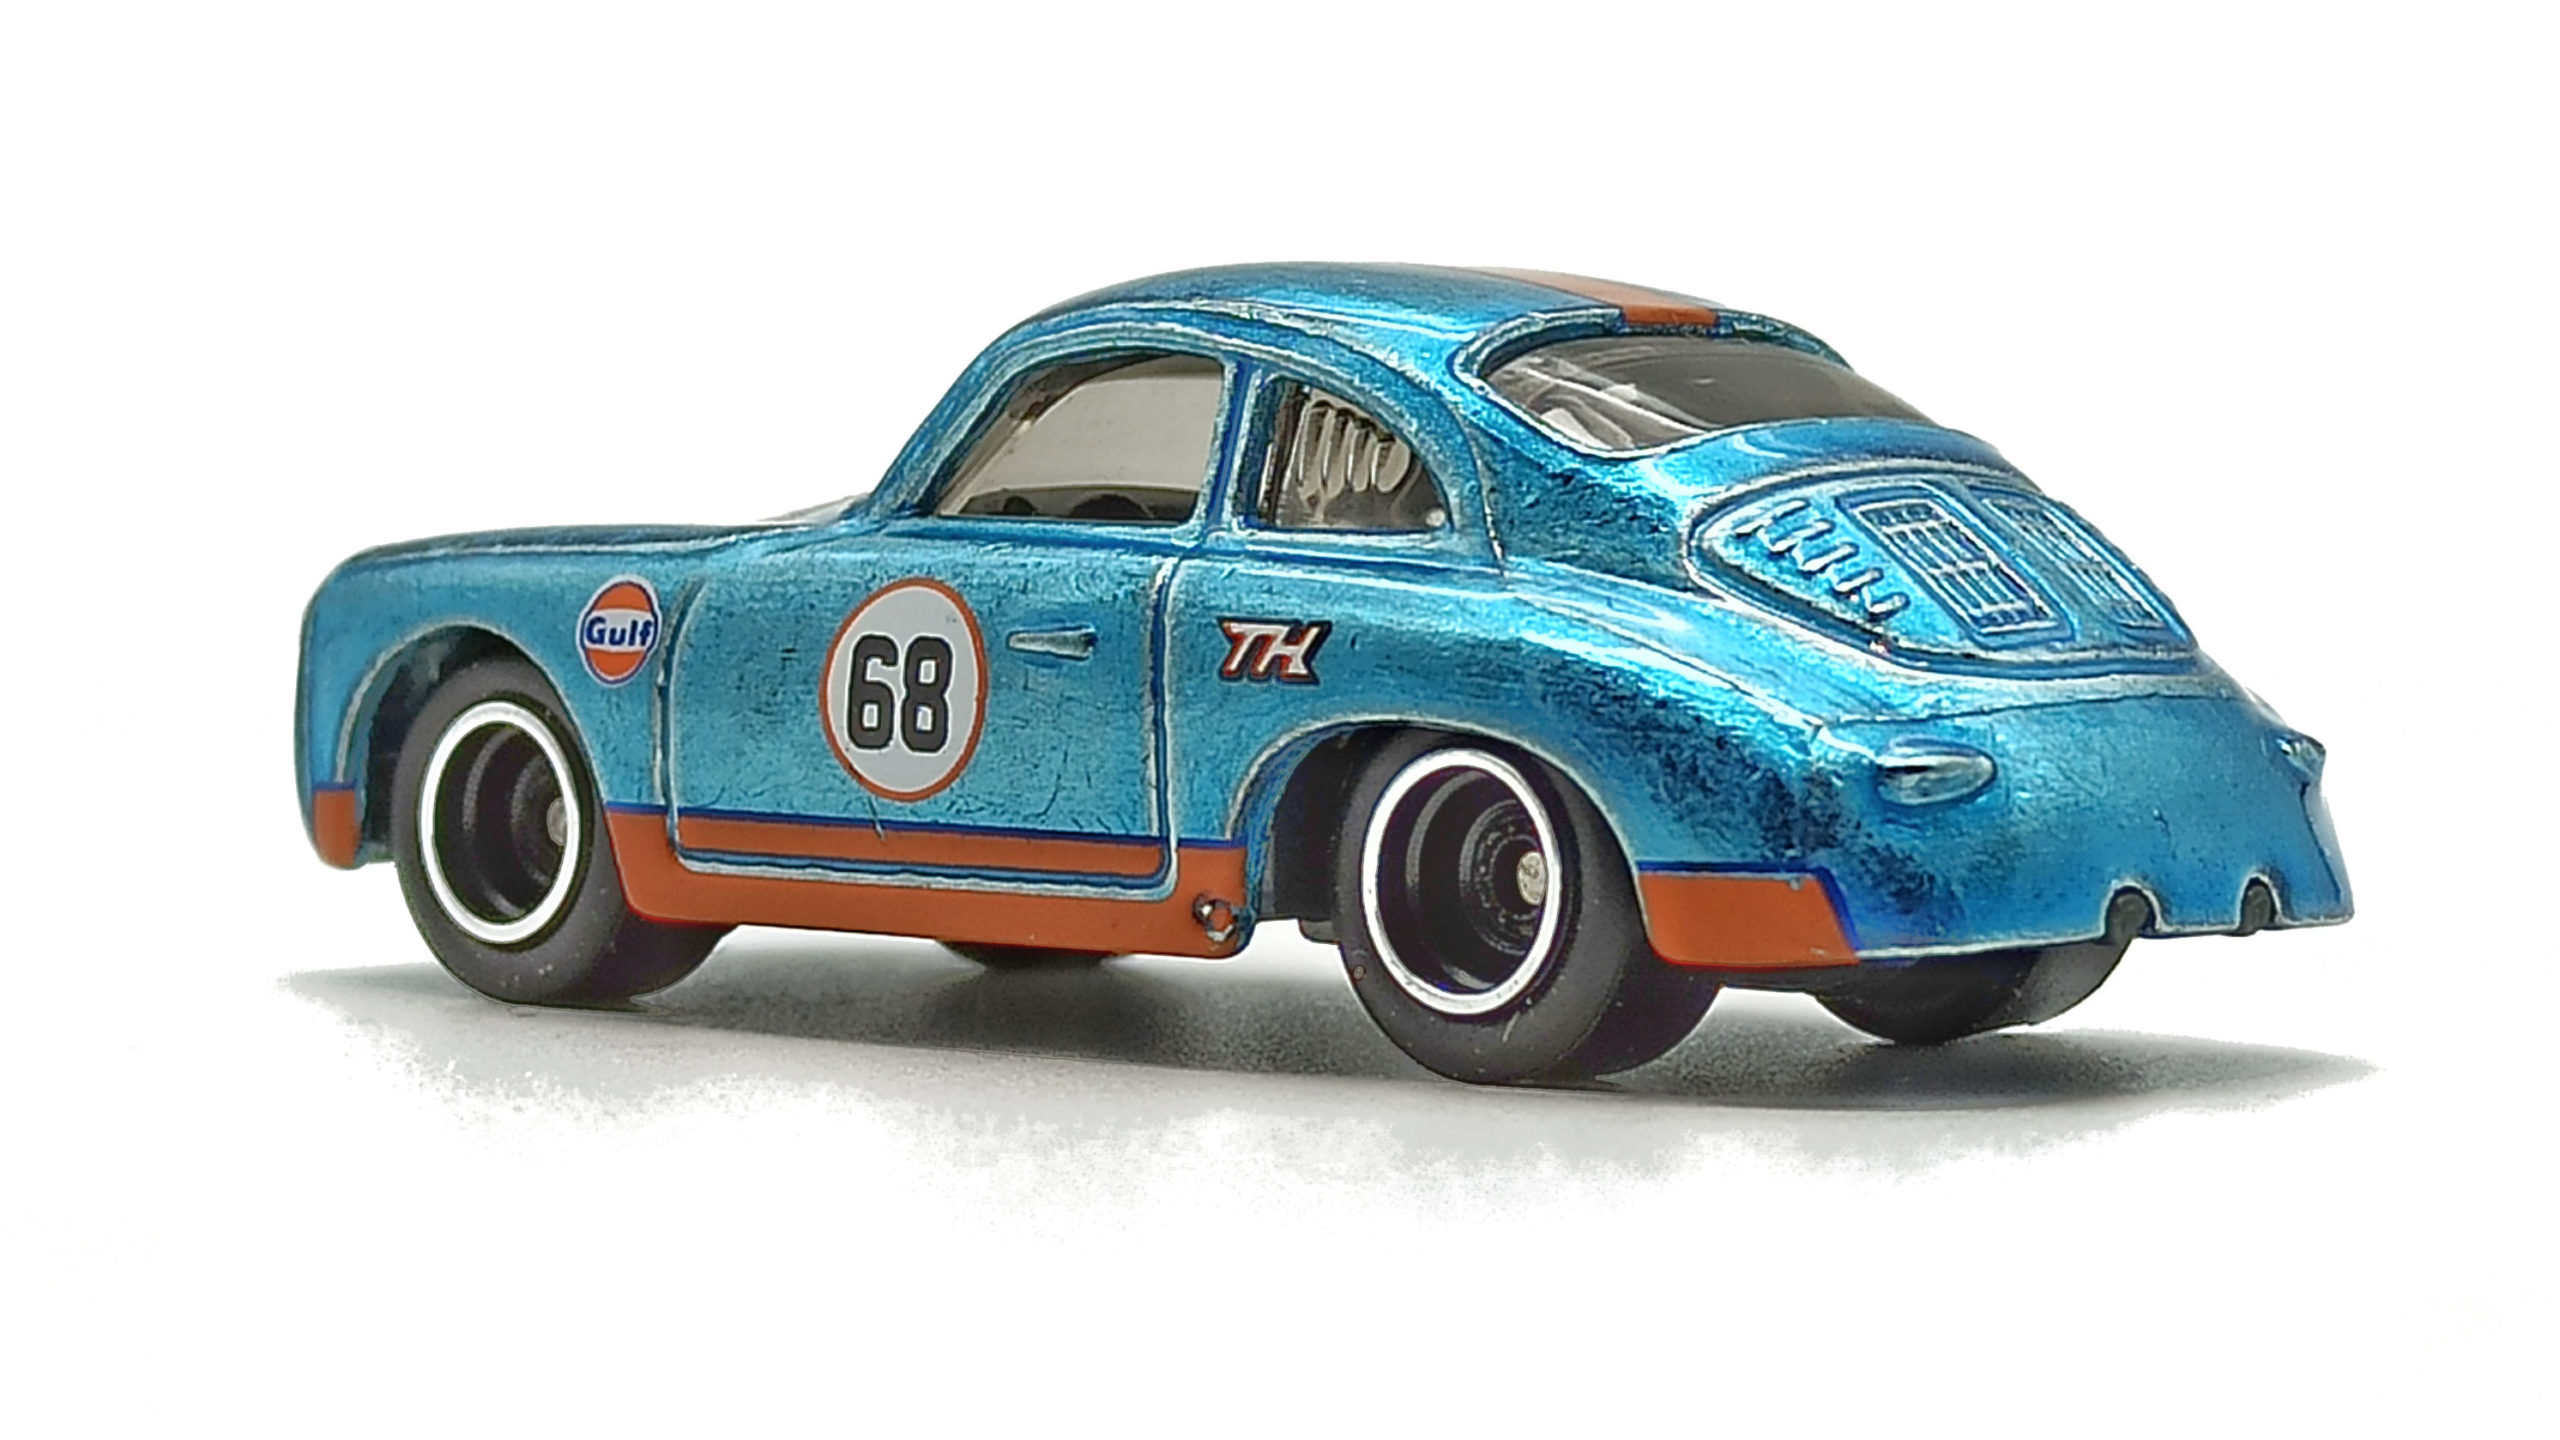 Hot Wheels Porsche 356 Outlaw (GTD08) 2021 (171/250) HW Speed Graphics (7/10) spectraflame light blue (Gulf) Super Treasure Hunt (STH) side angle